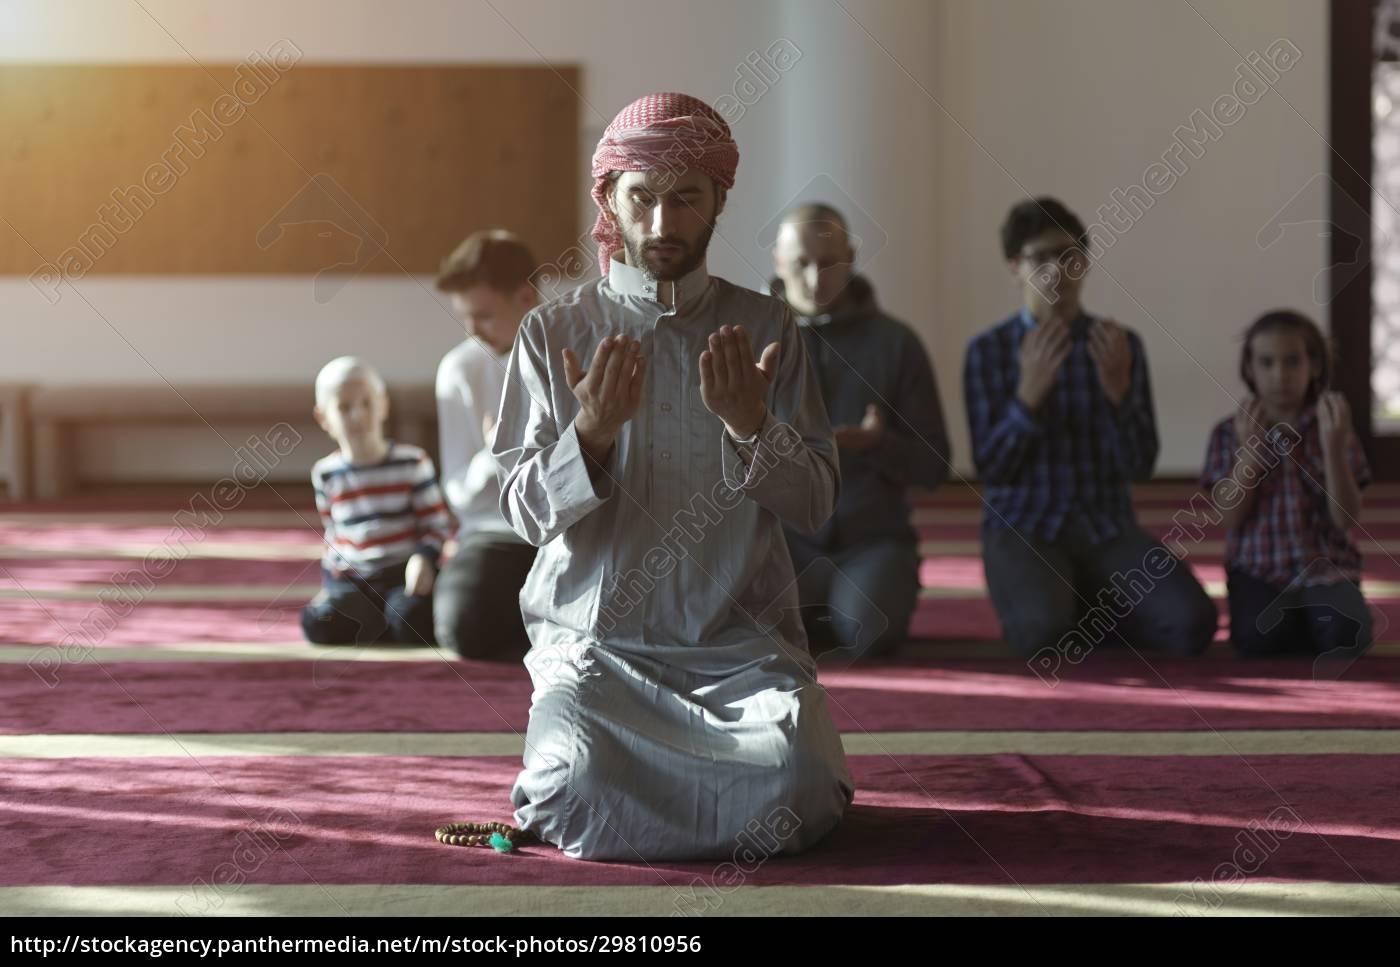 muslim, people, praying, in, mosque - 29810956